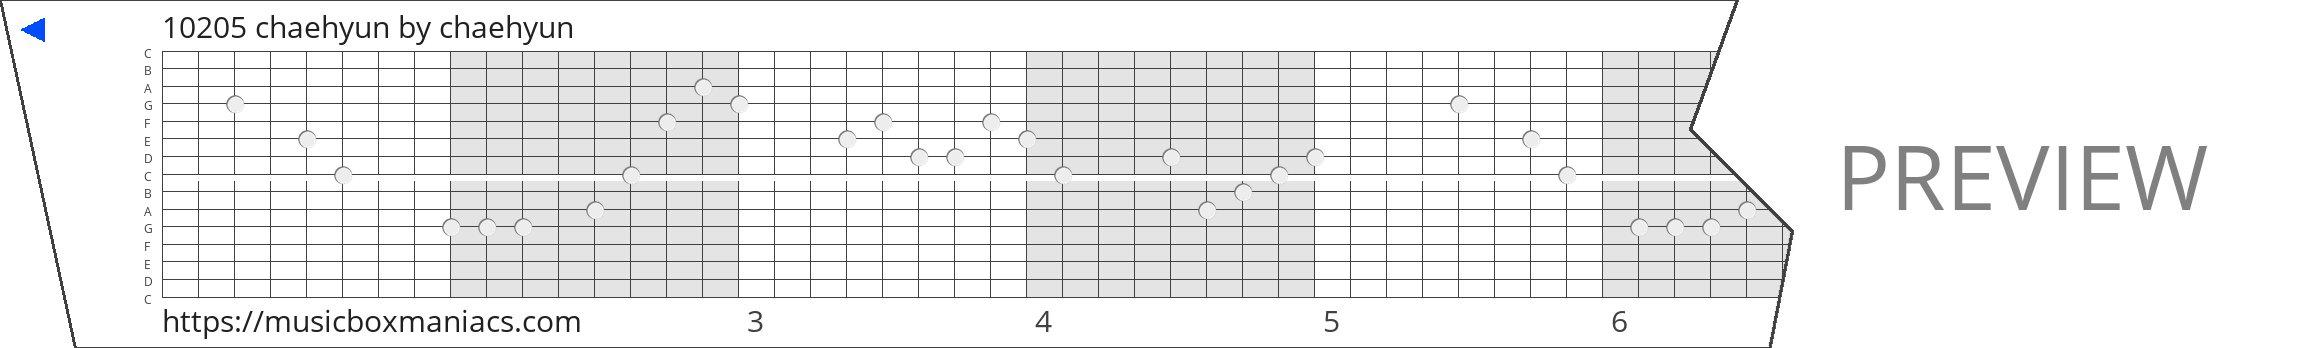 10205 chaehyun 15 note music box paper strip